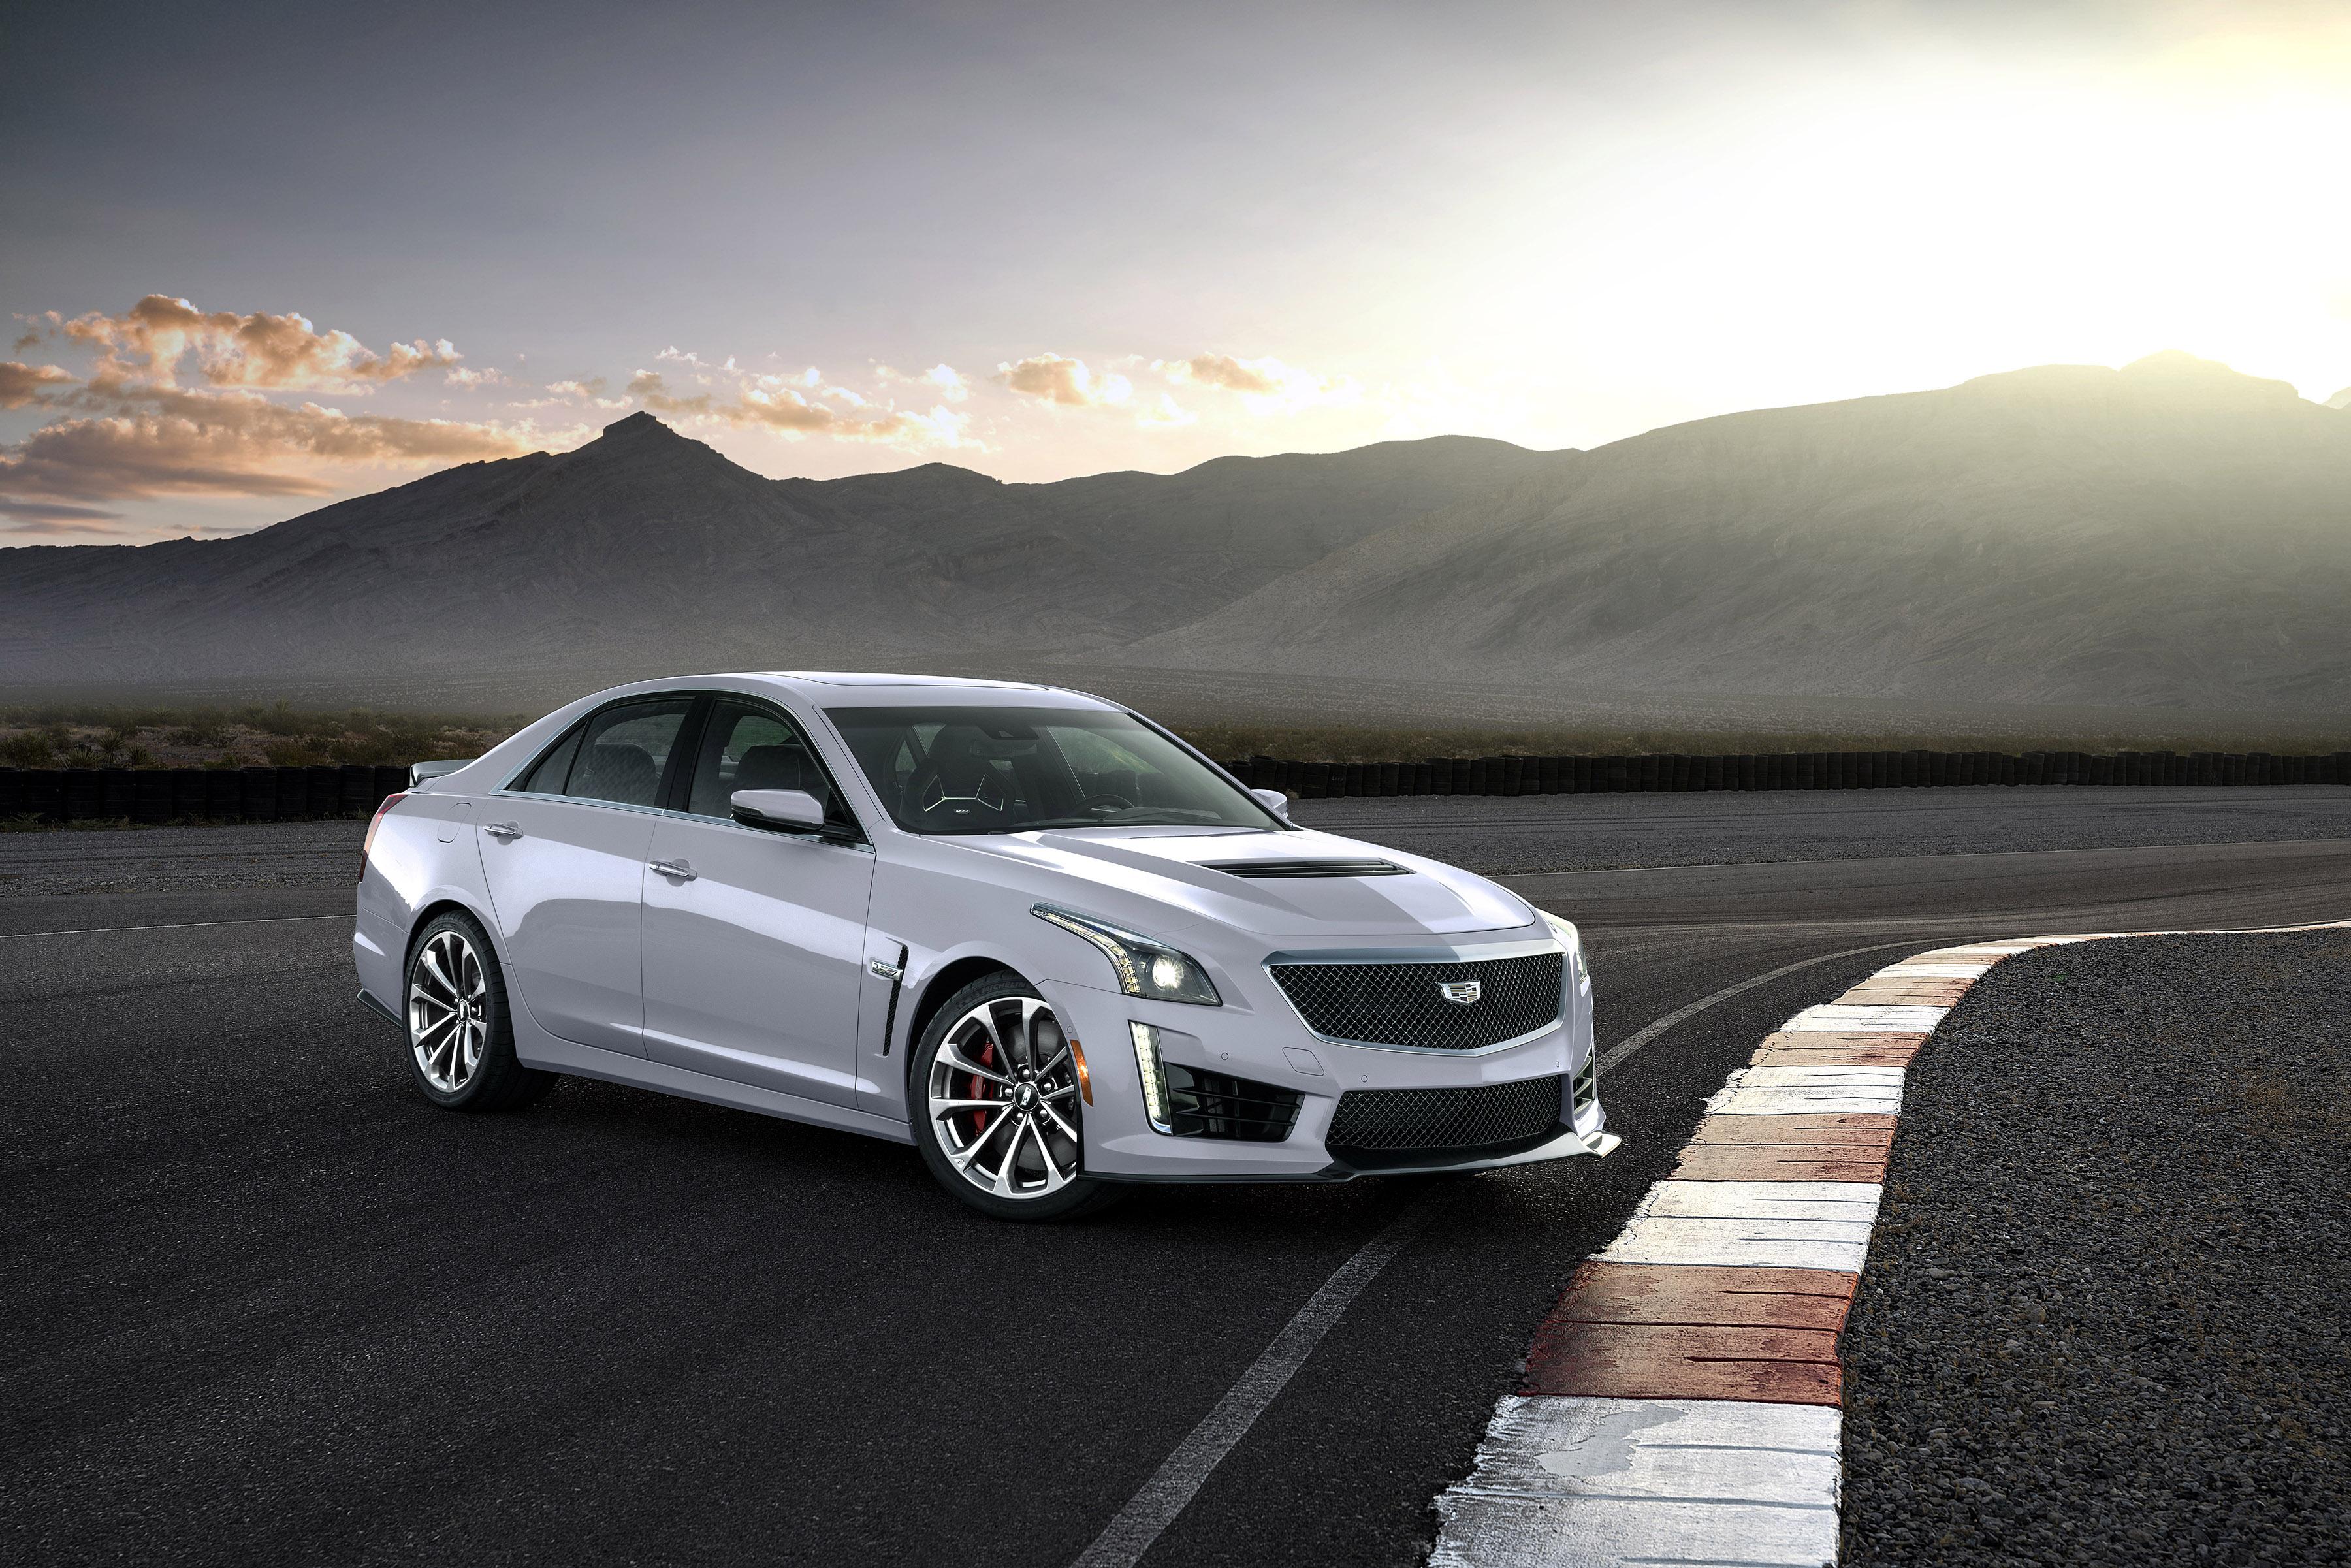 Introducing The 2018 Cadillac Cts V Glacier Metallic Edition